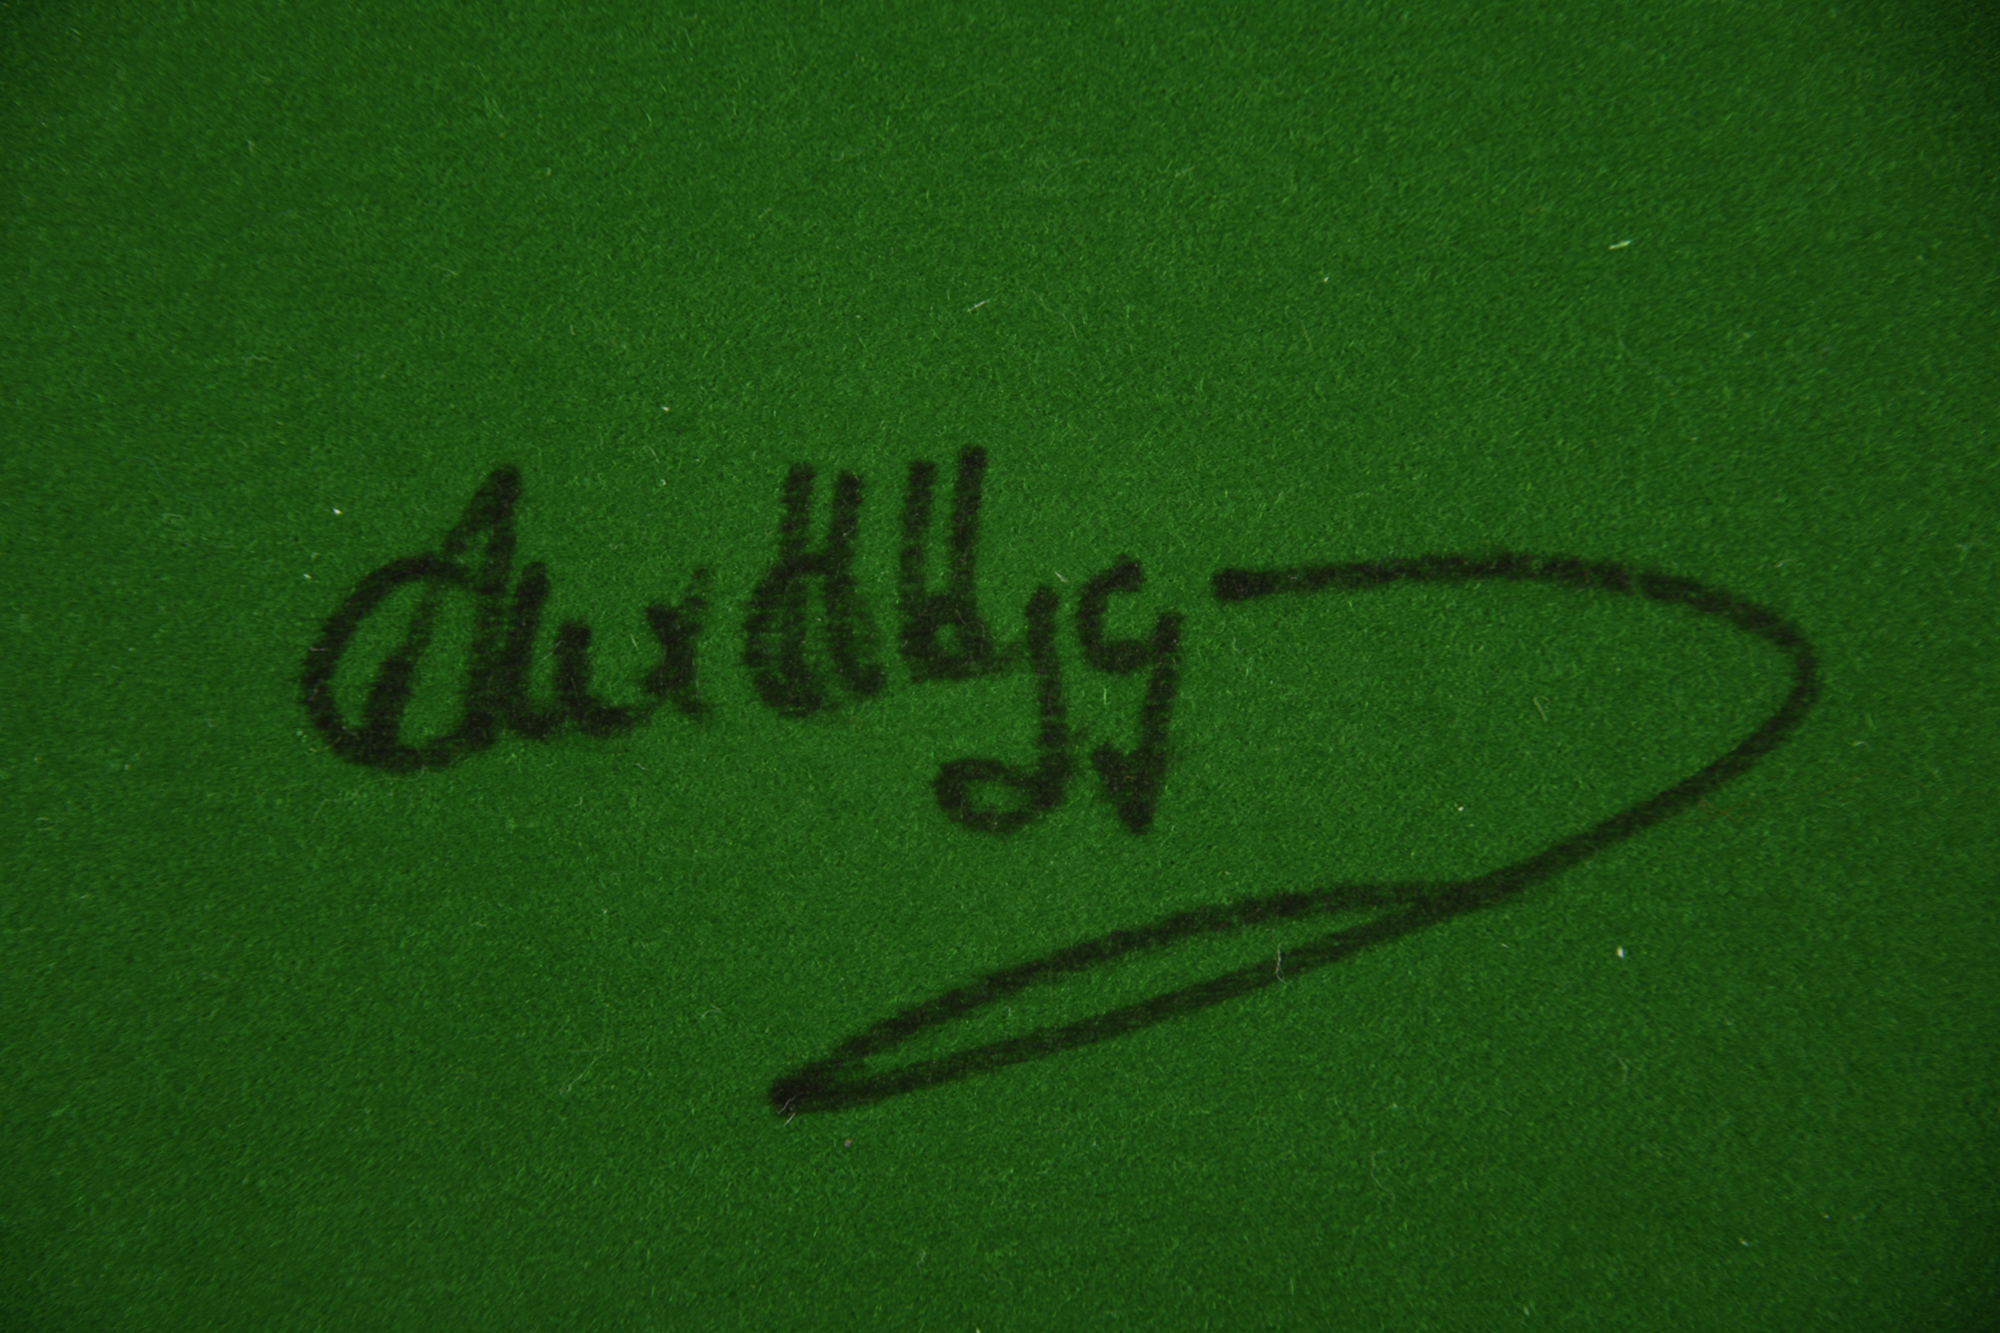 ALEX HIGGINS & JIMMY WHITE Original signatures - Image 3 of 4